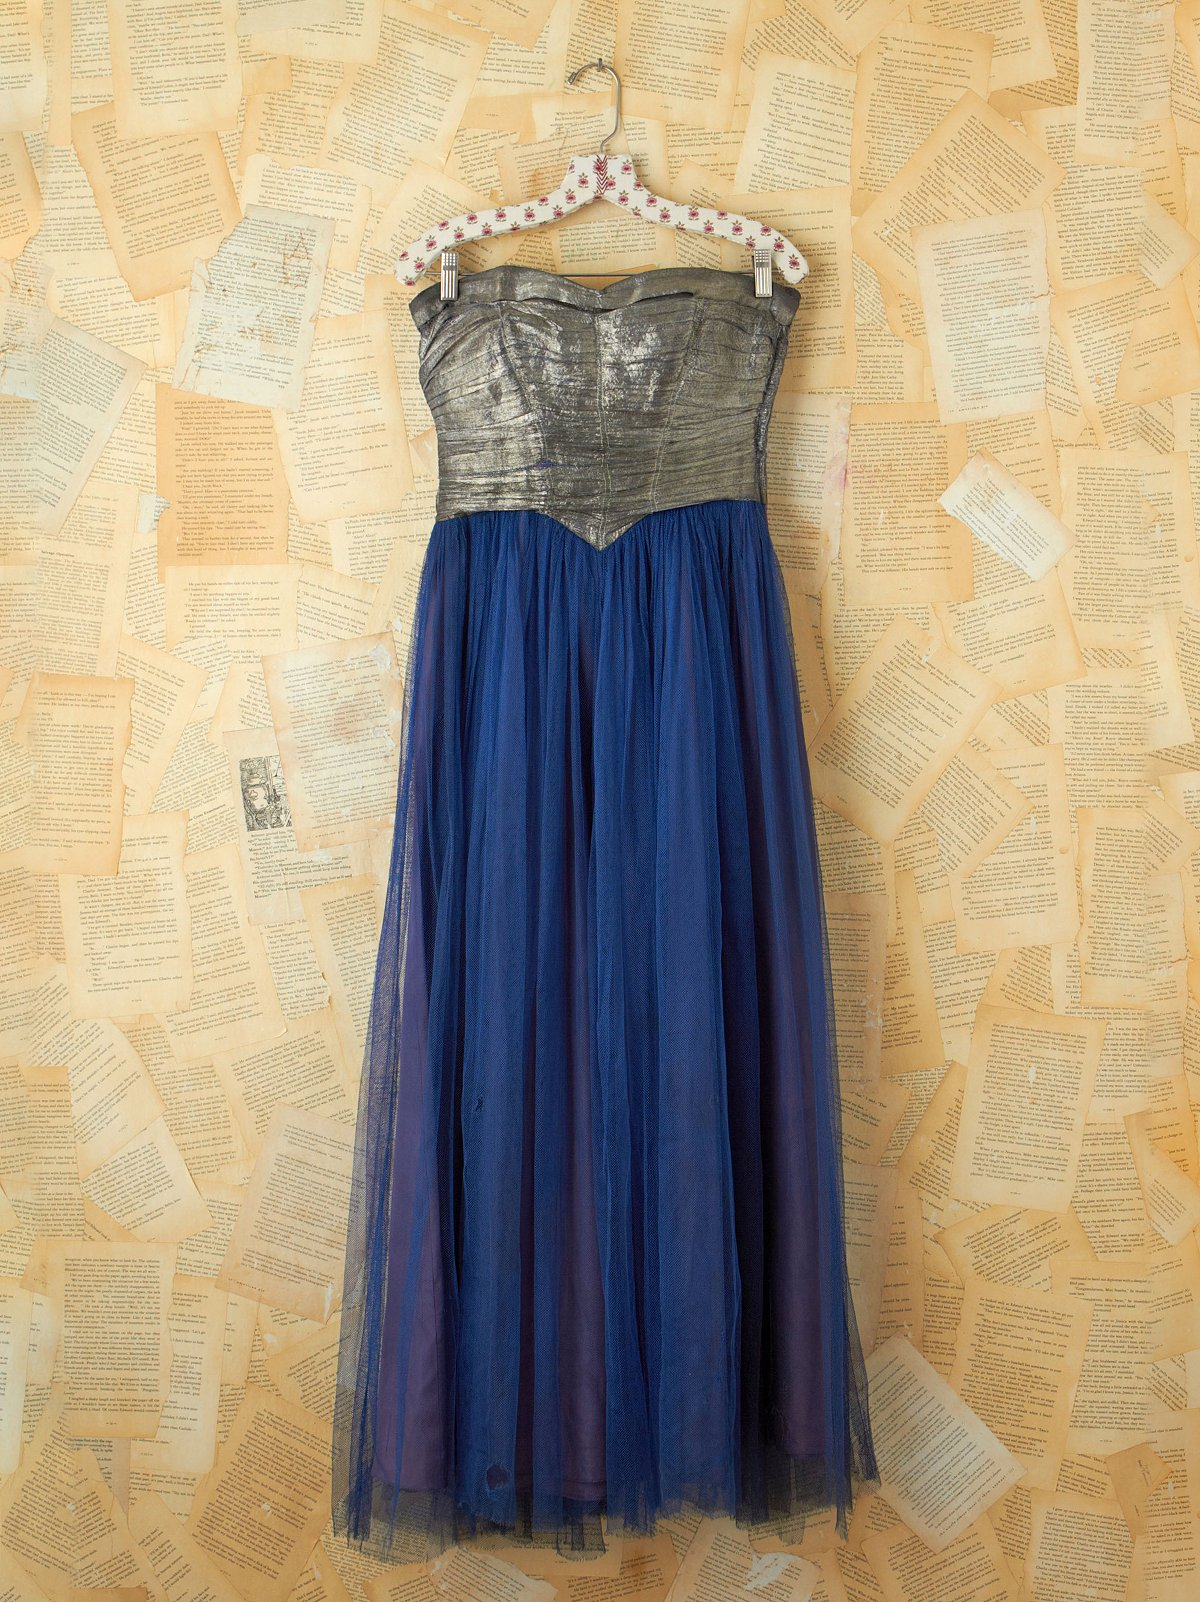 Vintage Blue Tulle Party Dress